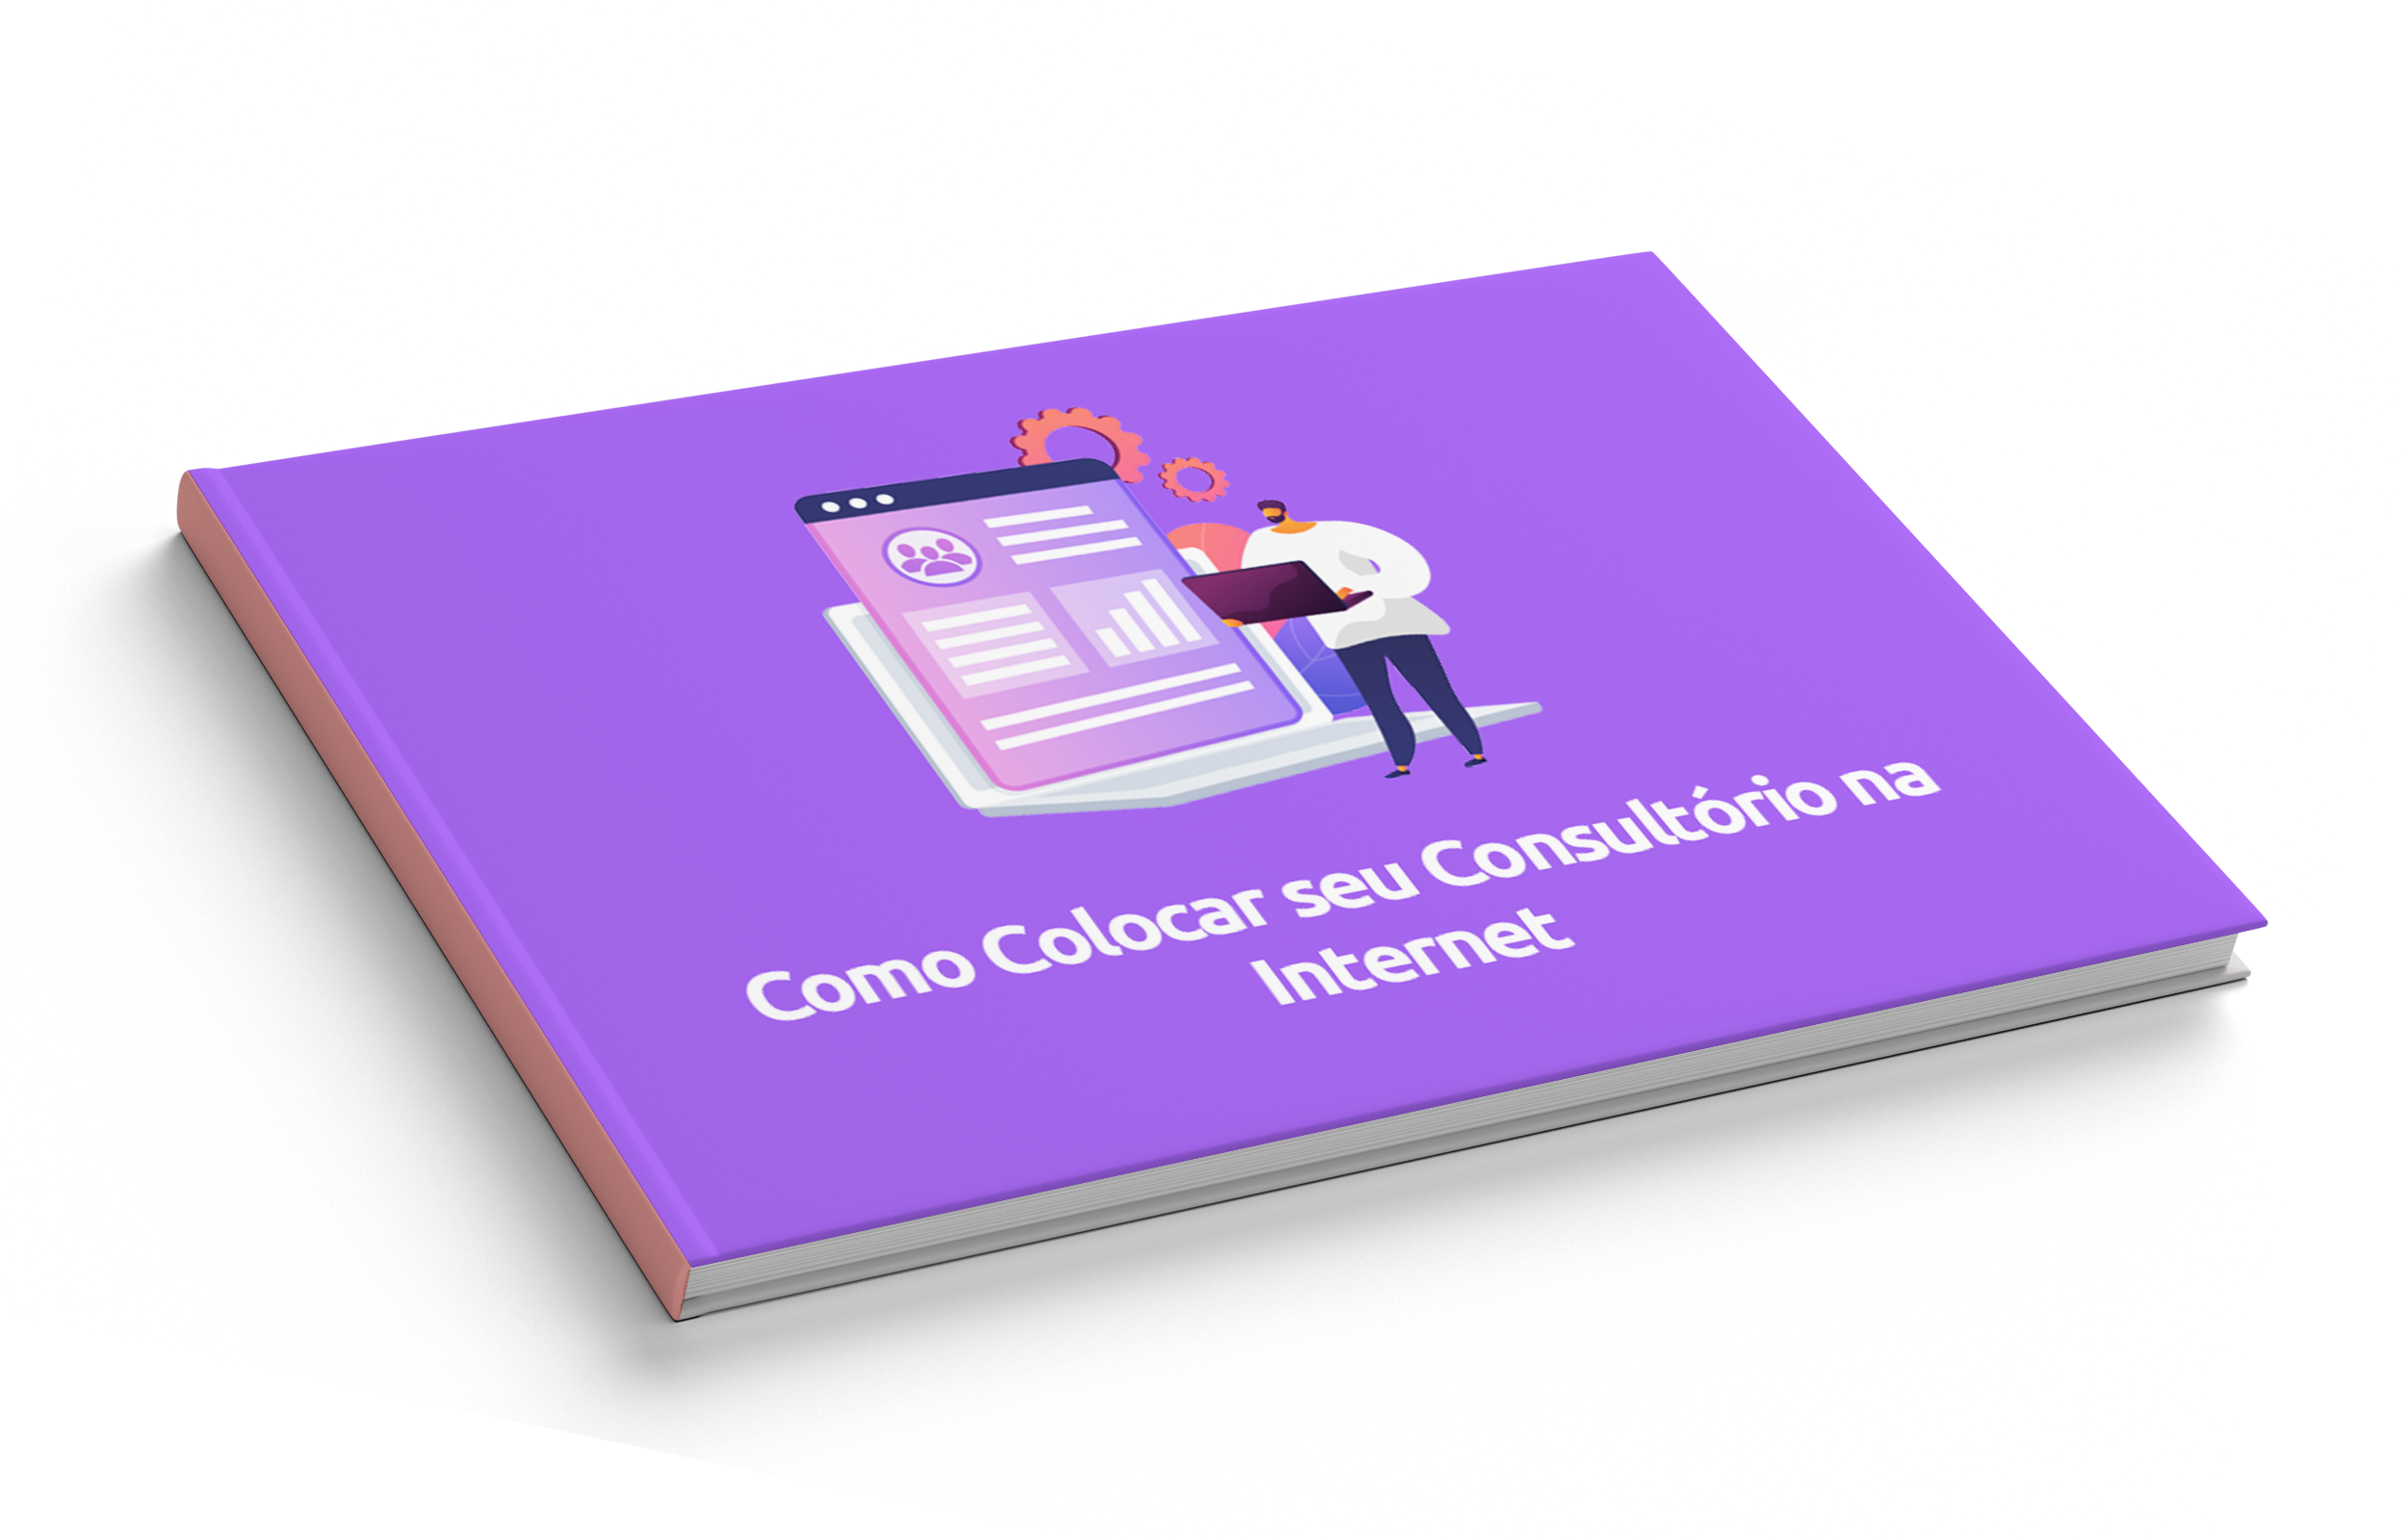 Mockup_E-Book - Como Colocar